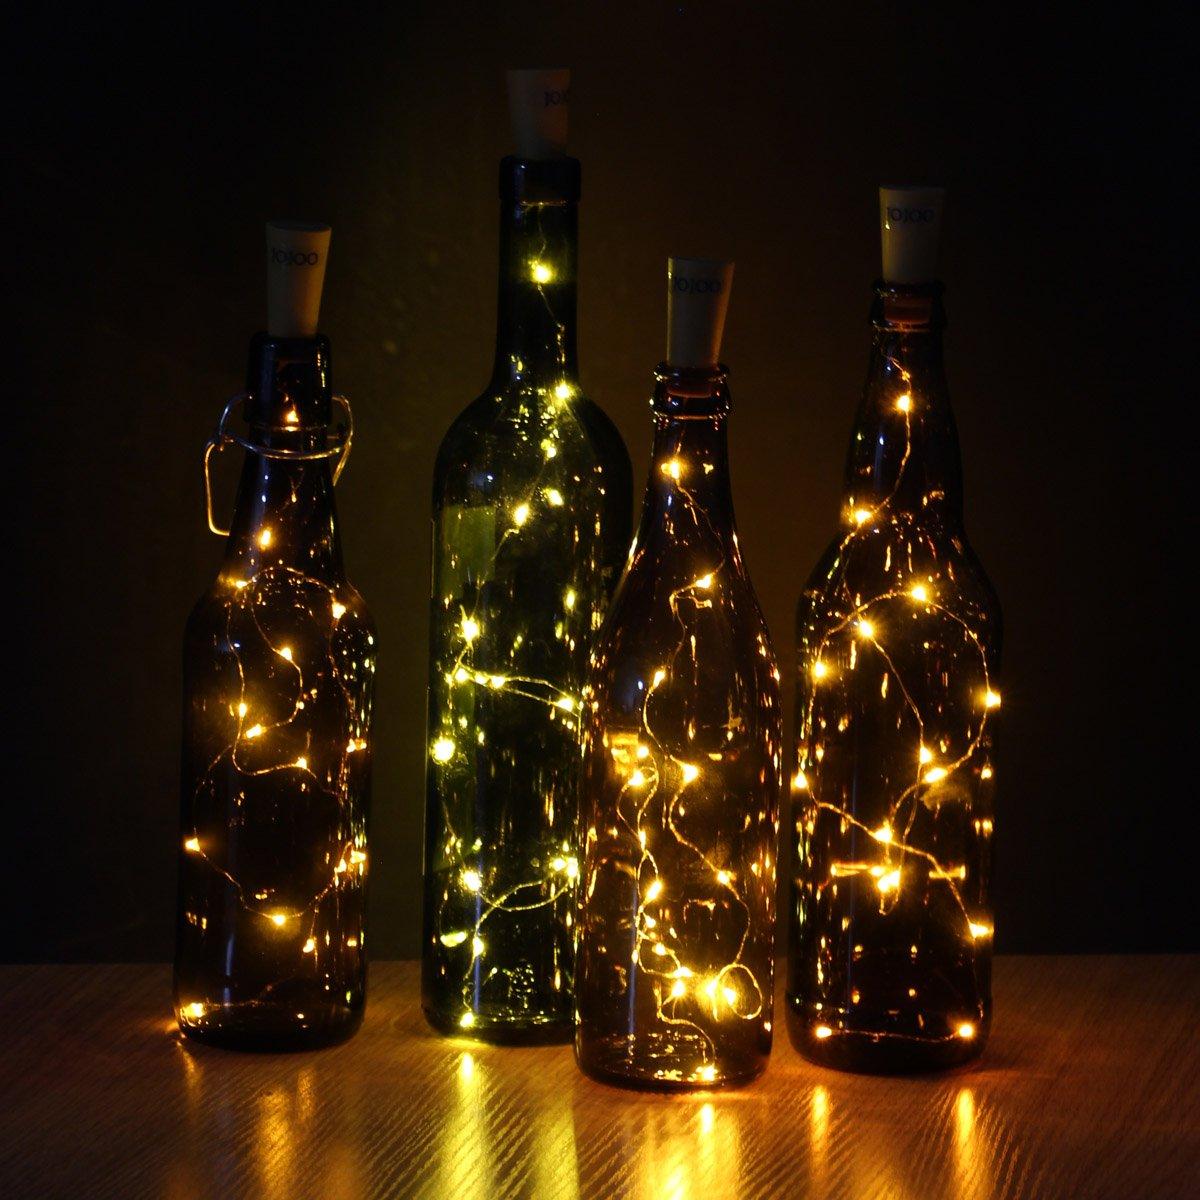 Lights For Wine Bottles Amazoncom Jojoo Set Of 6 Warm White Wine Bottle Cork Lights